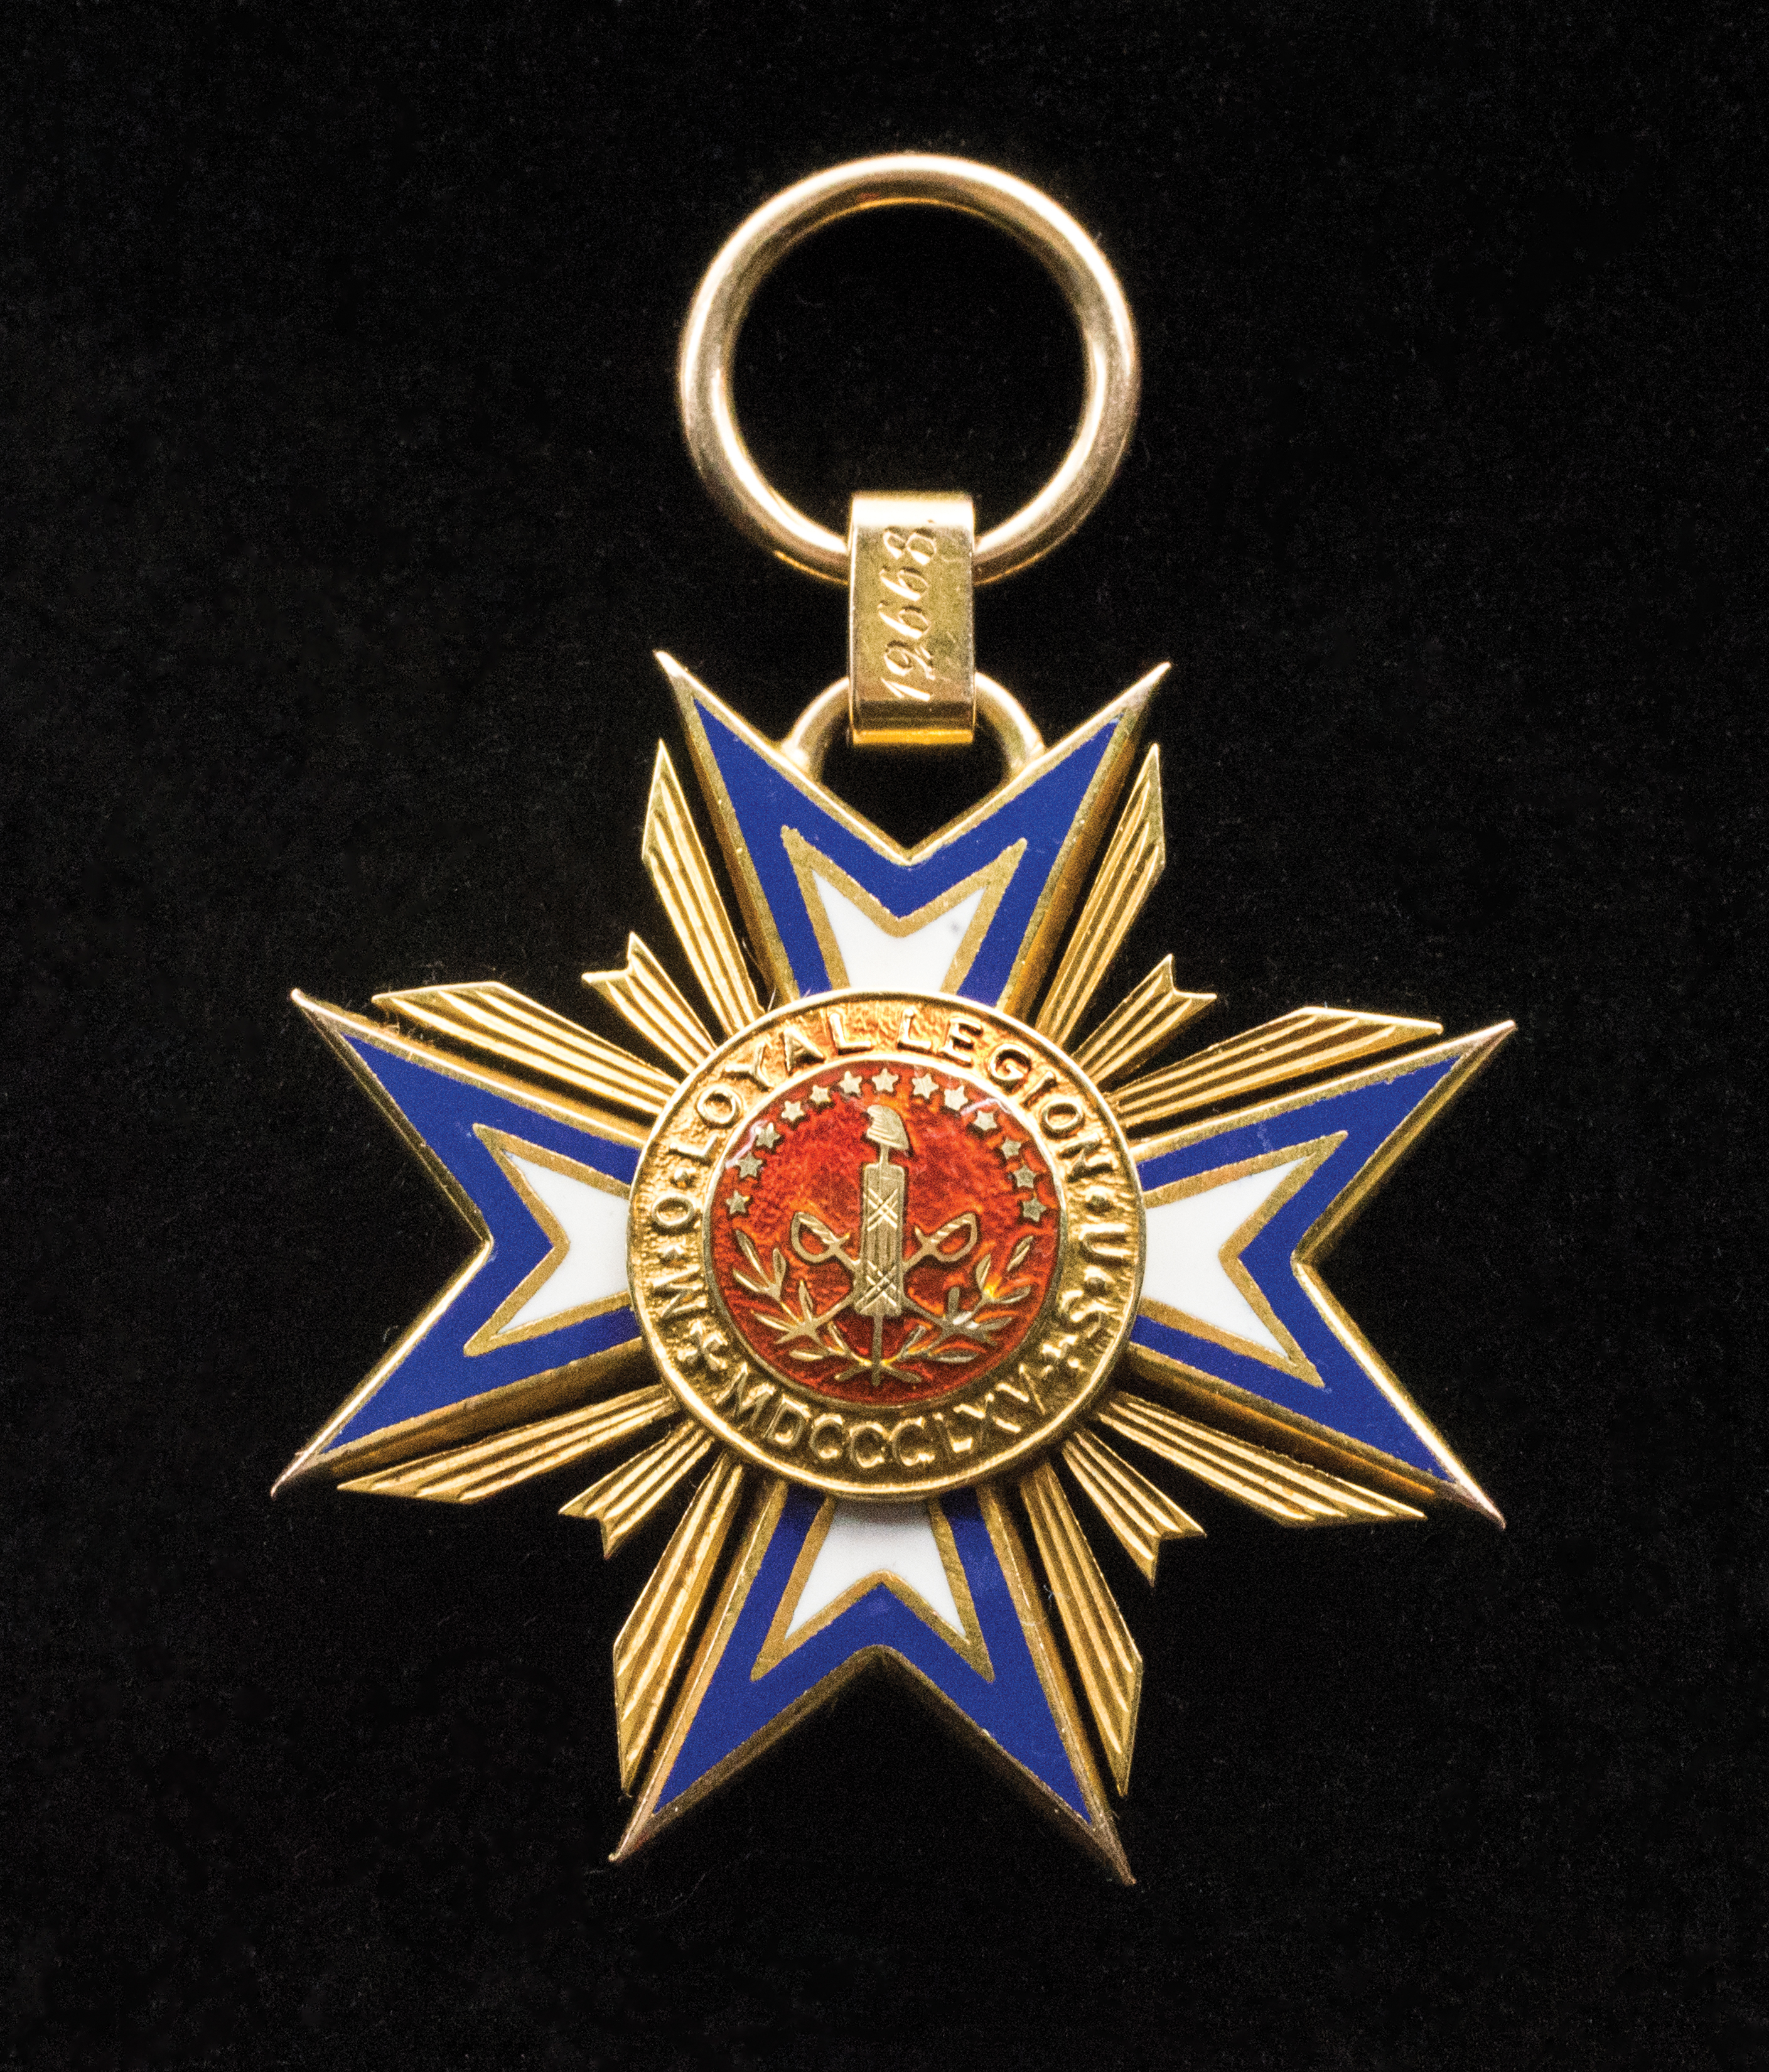 badge, military, order, loyal, legion